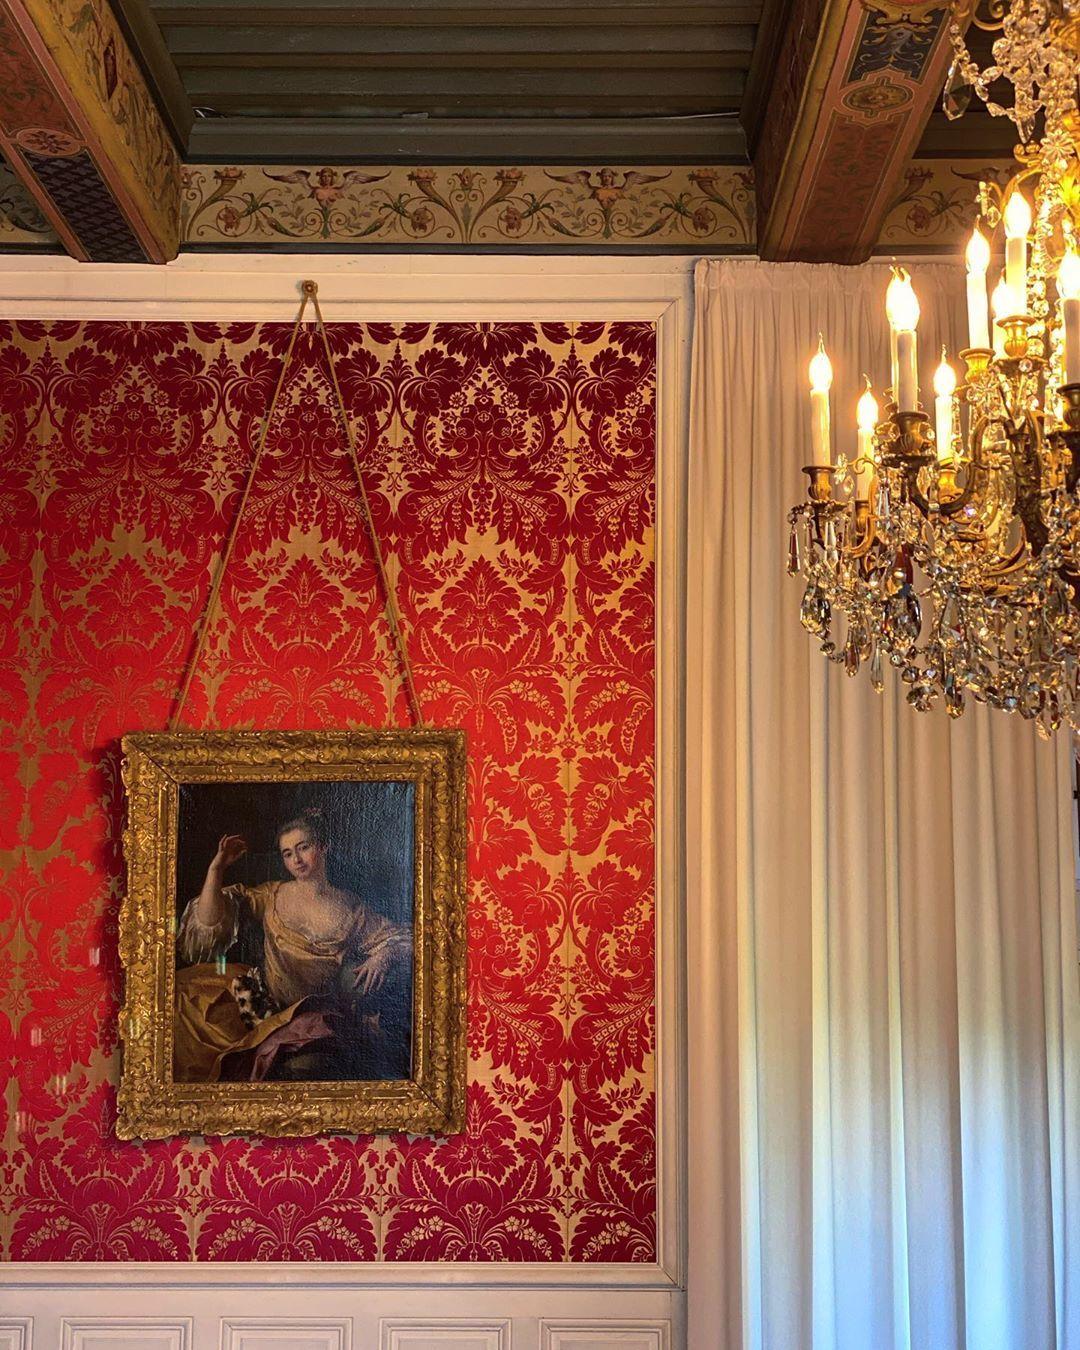 "⚜️HistoryAndHeritage⚜️ on Instagram: ""Château de Grignan #interior #interiordesign #interiordecor #interiordecoration #interiorarchitecture #decoration #decorationinterieur…"""